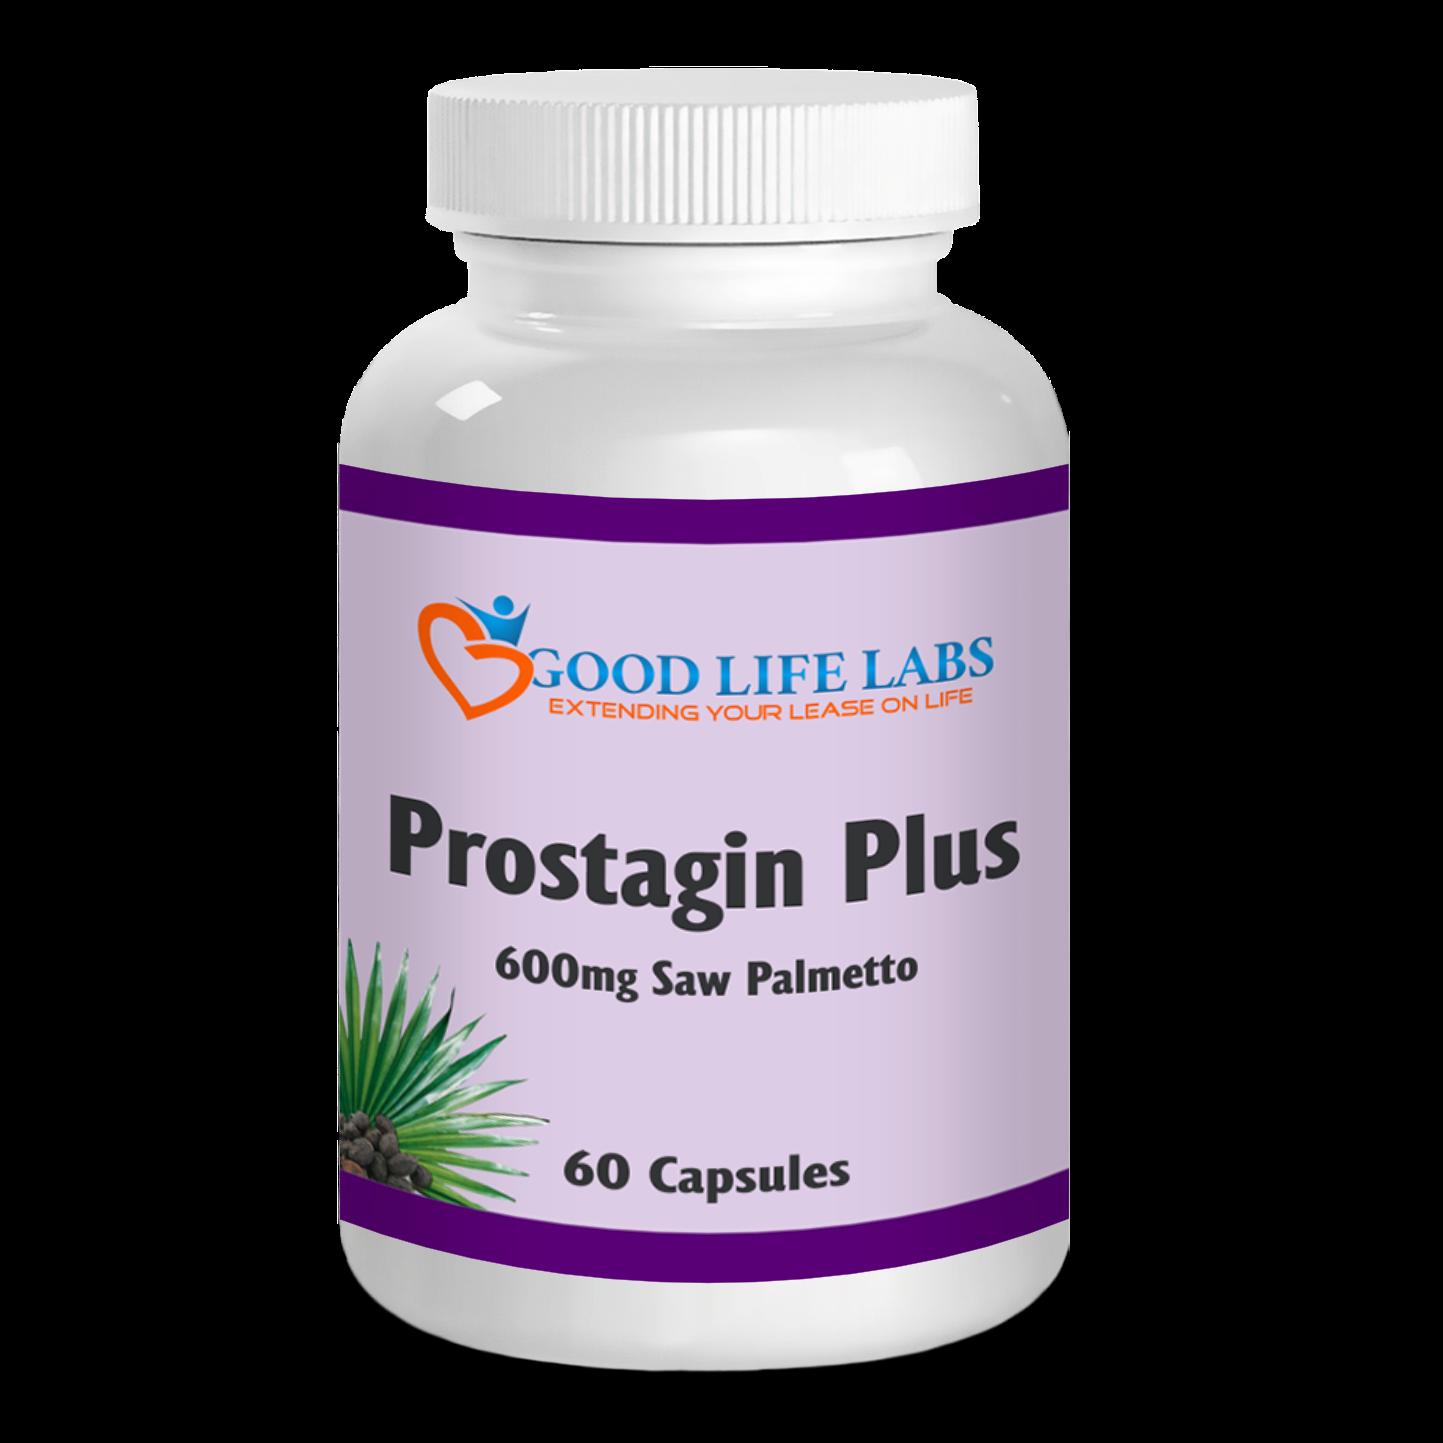 Prostagin Plus Good Life Labs Formula